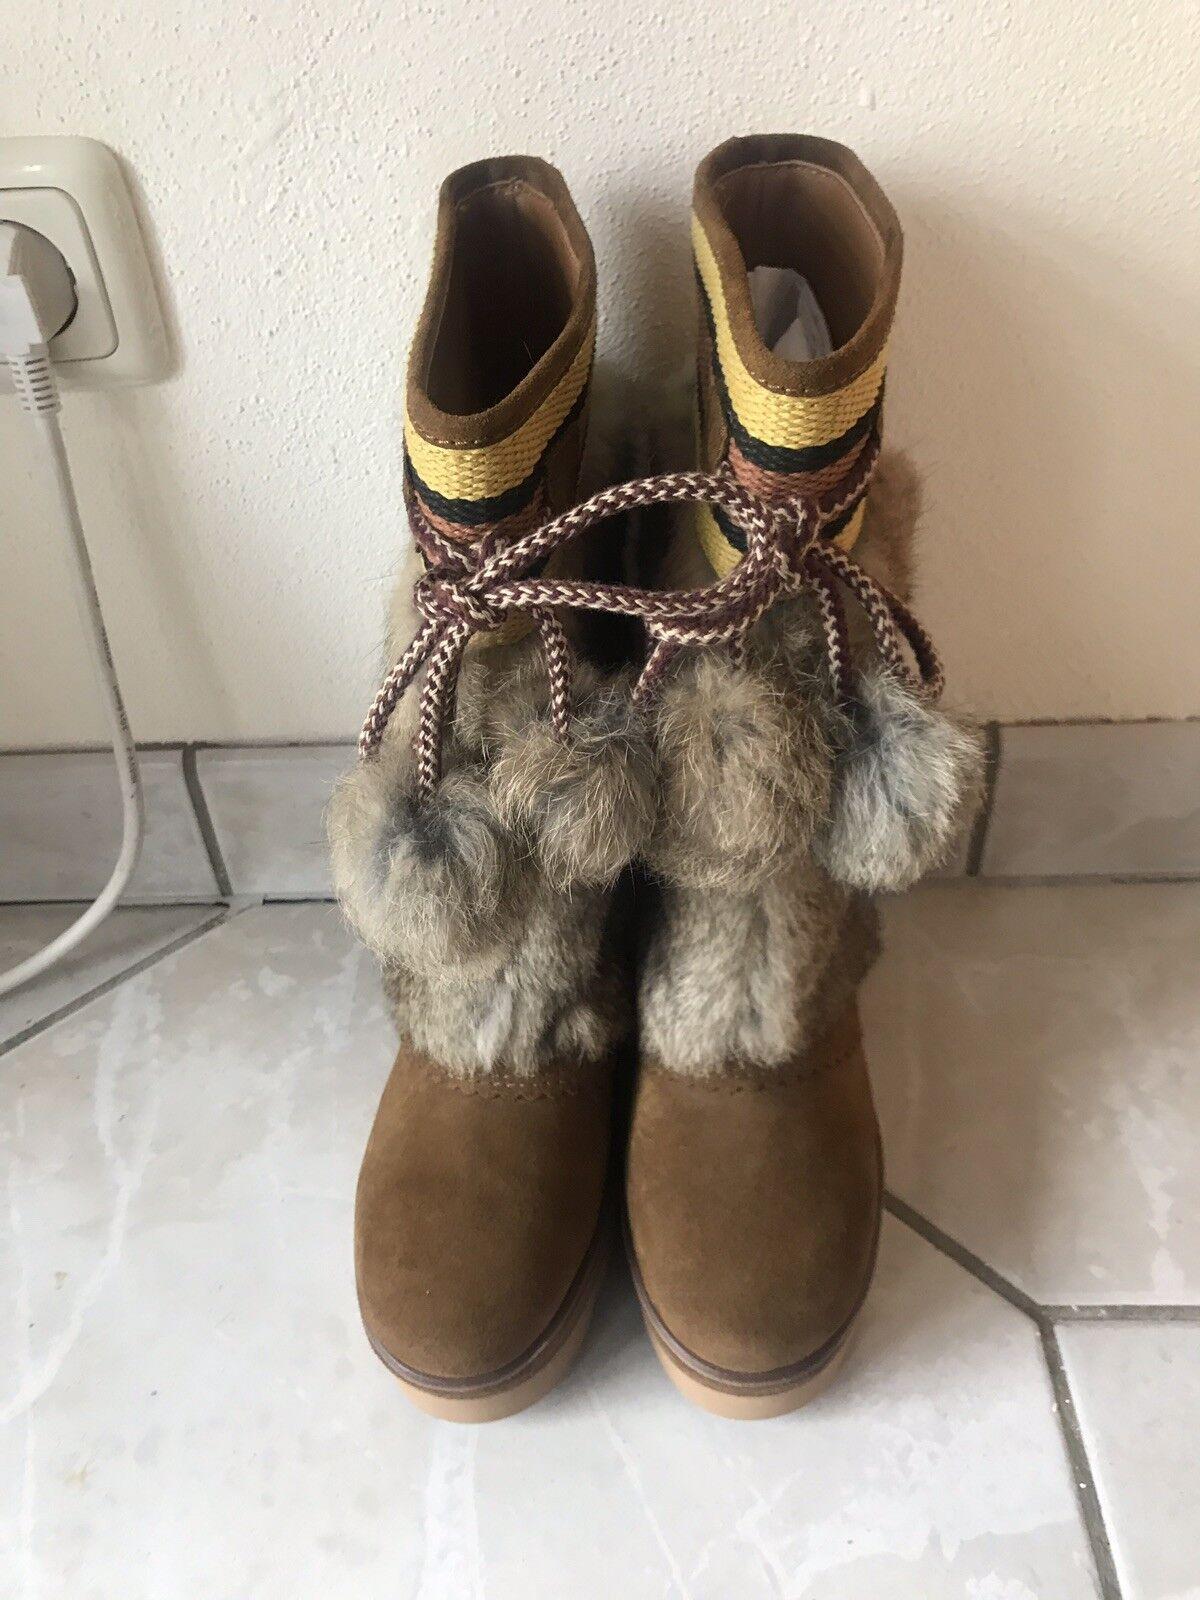 shopping online di moda See by by by Chloe pelliccia stivali invernali  EURO 38  conveniente